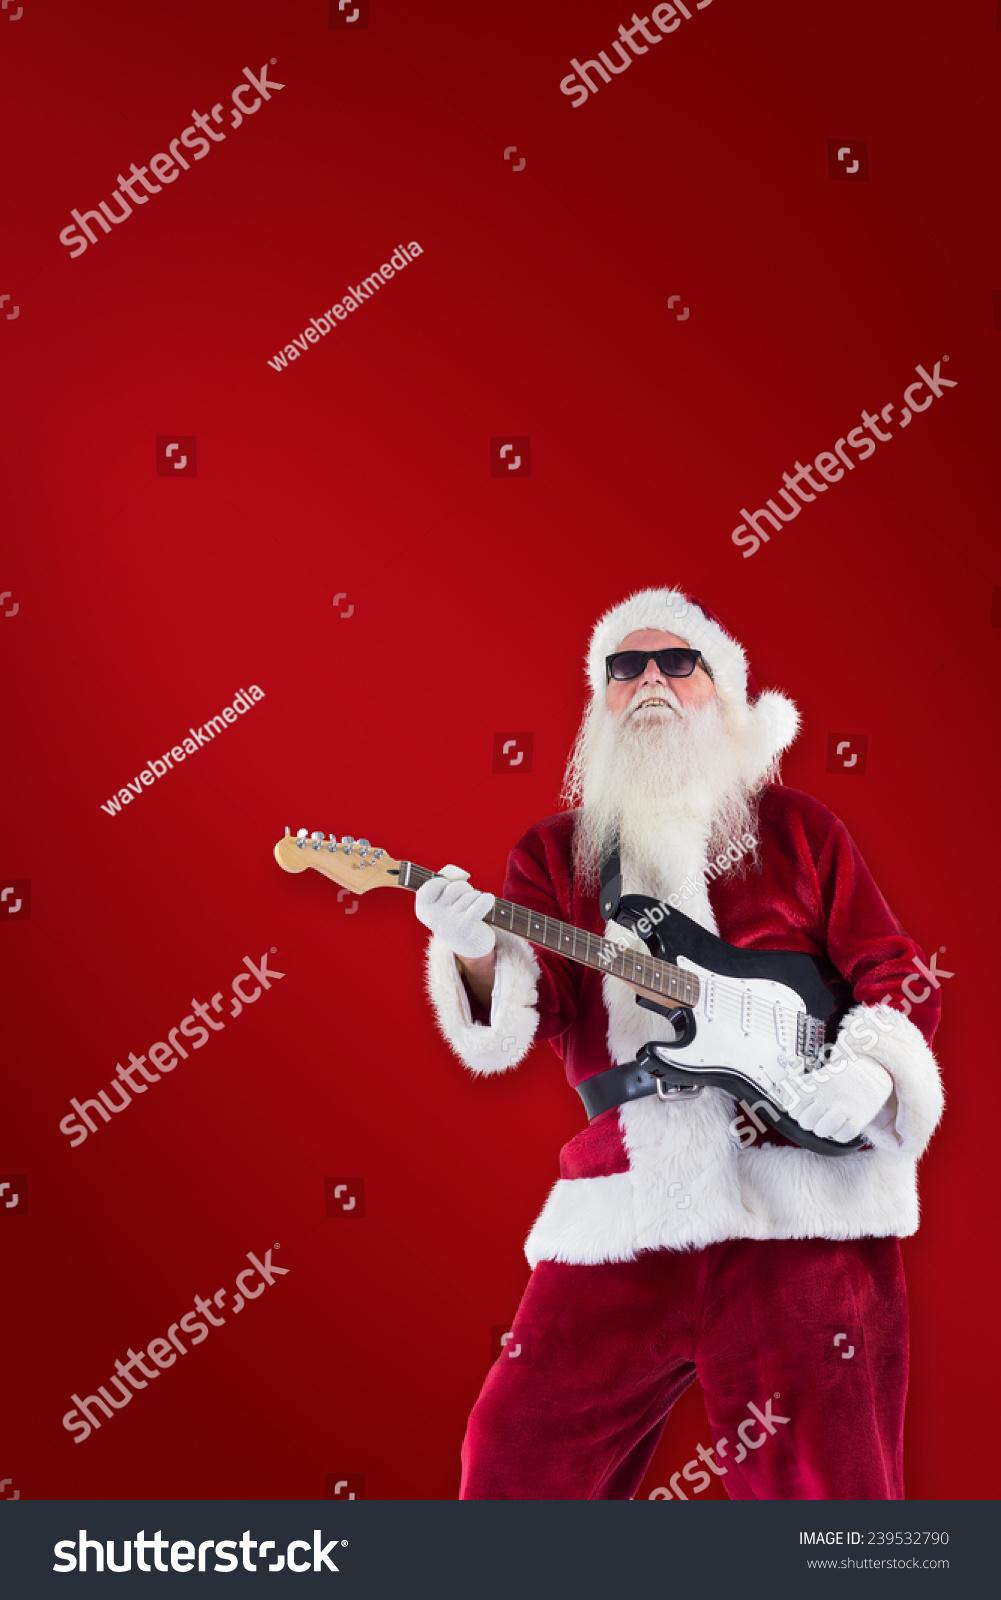 ppt背景图片 小动物弹吉他